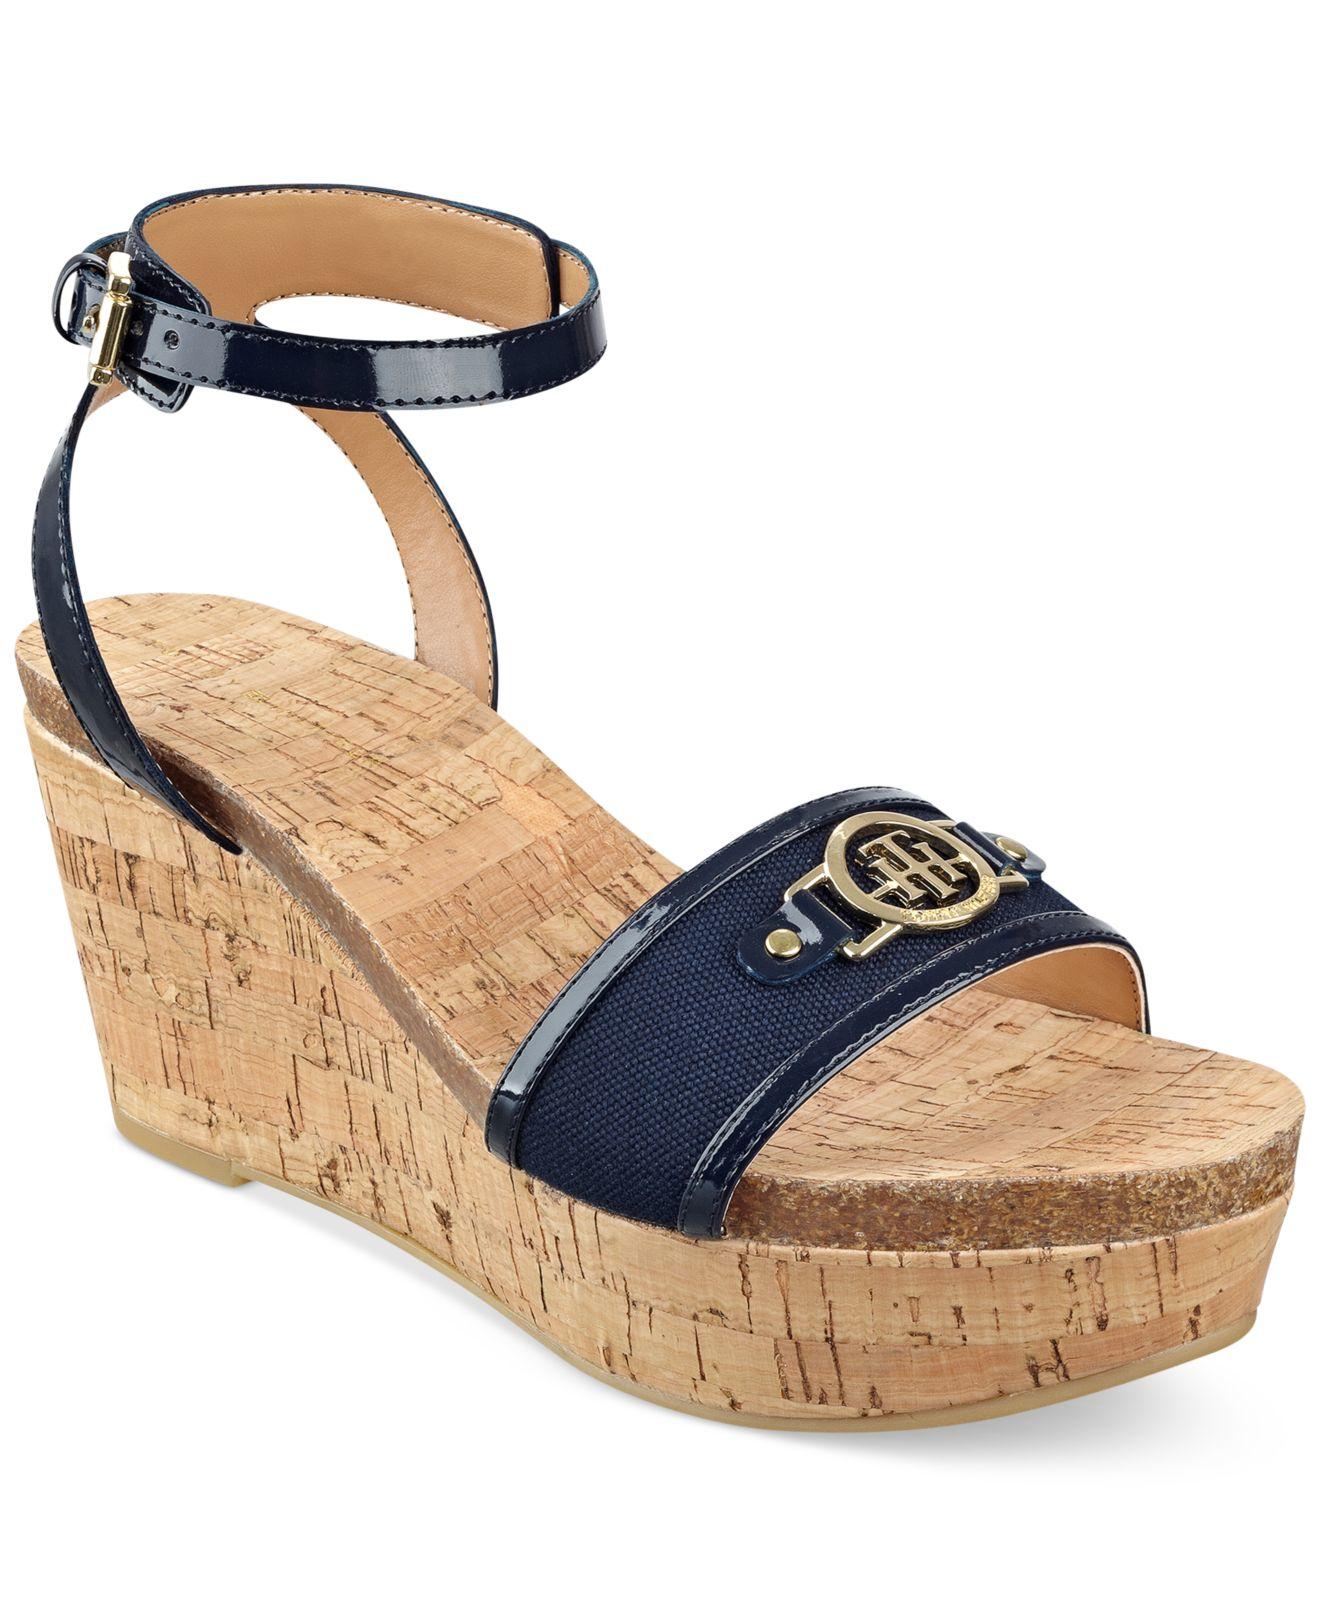 27fd5ff17e94ae Lyst - Tommy Hilfiger Hesley Platform Wedge Sandals in Natural